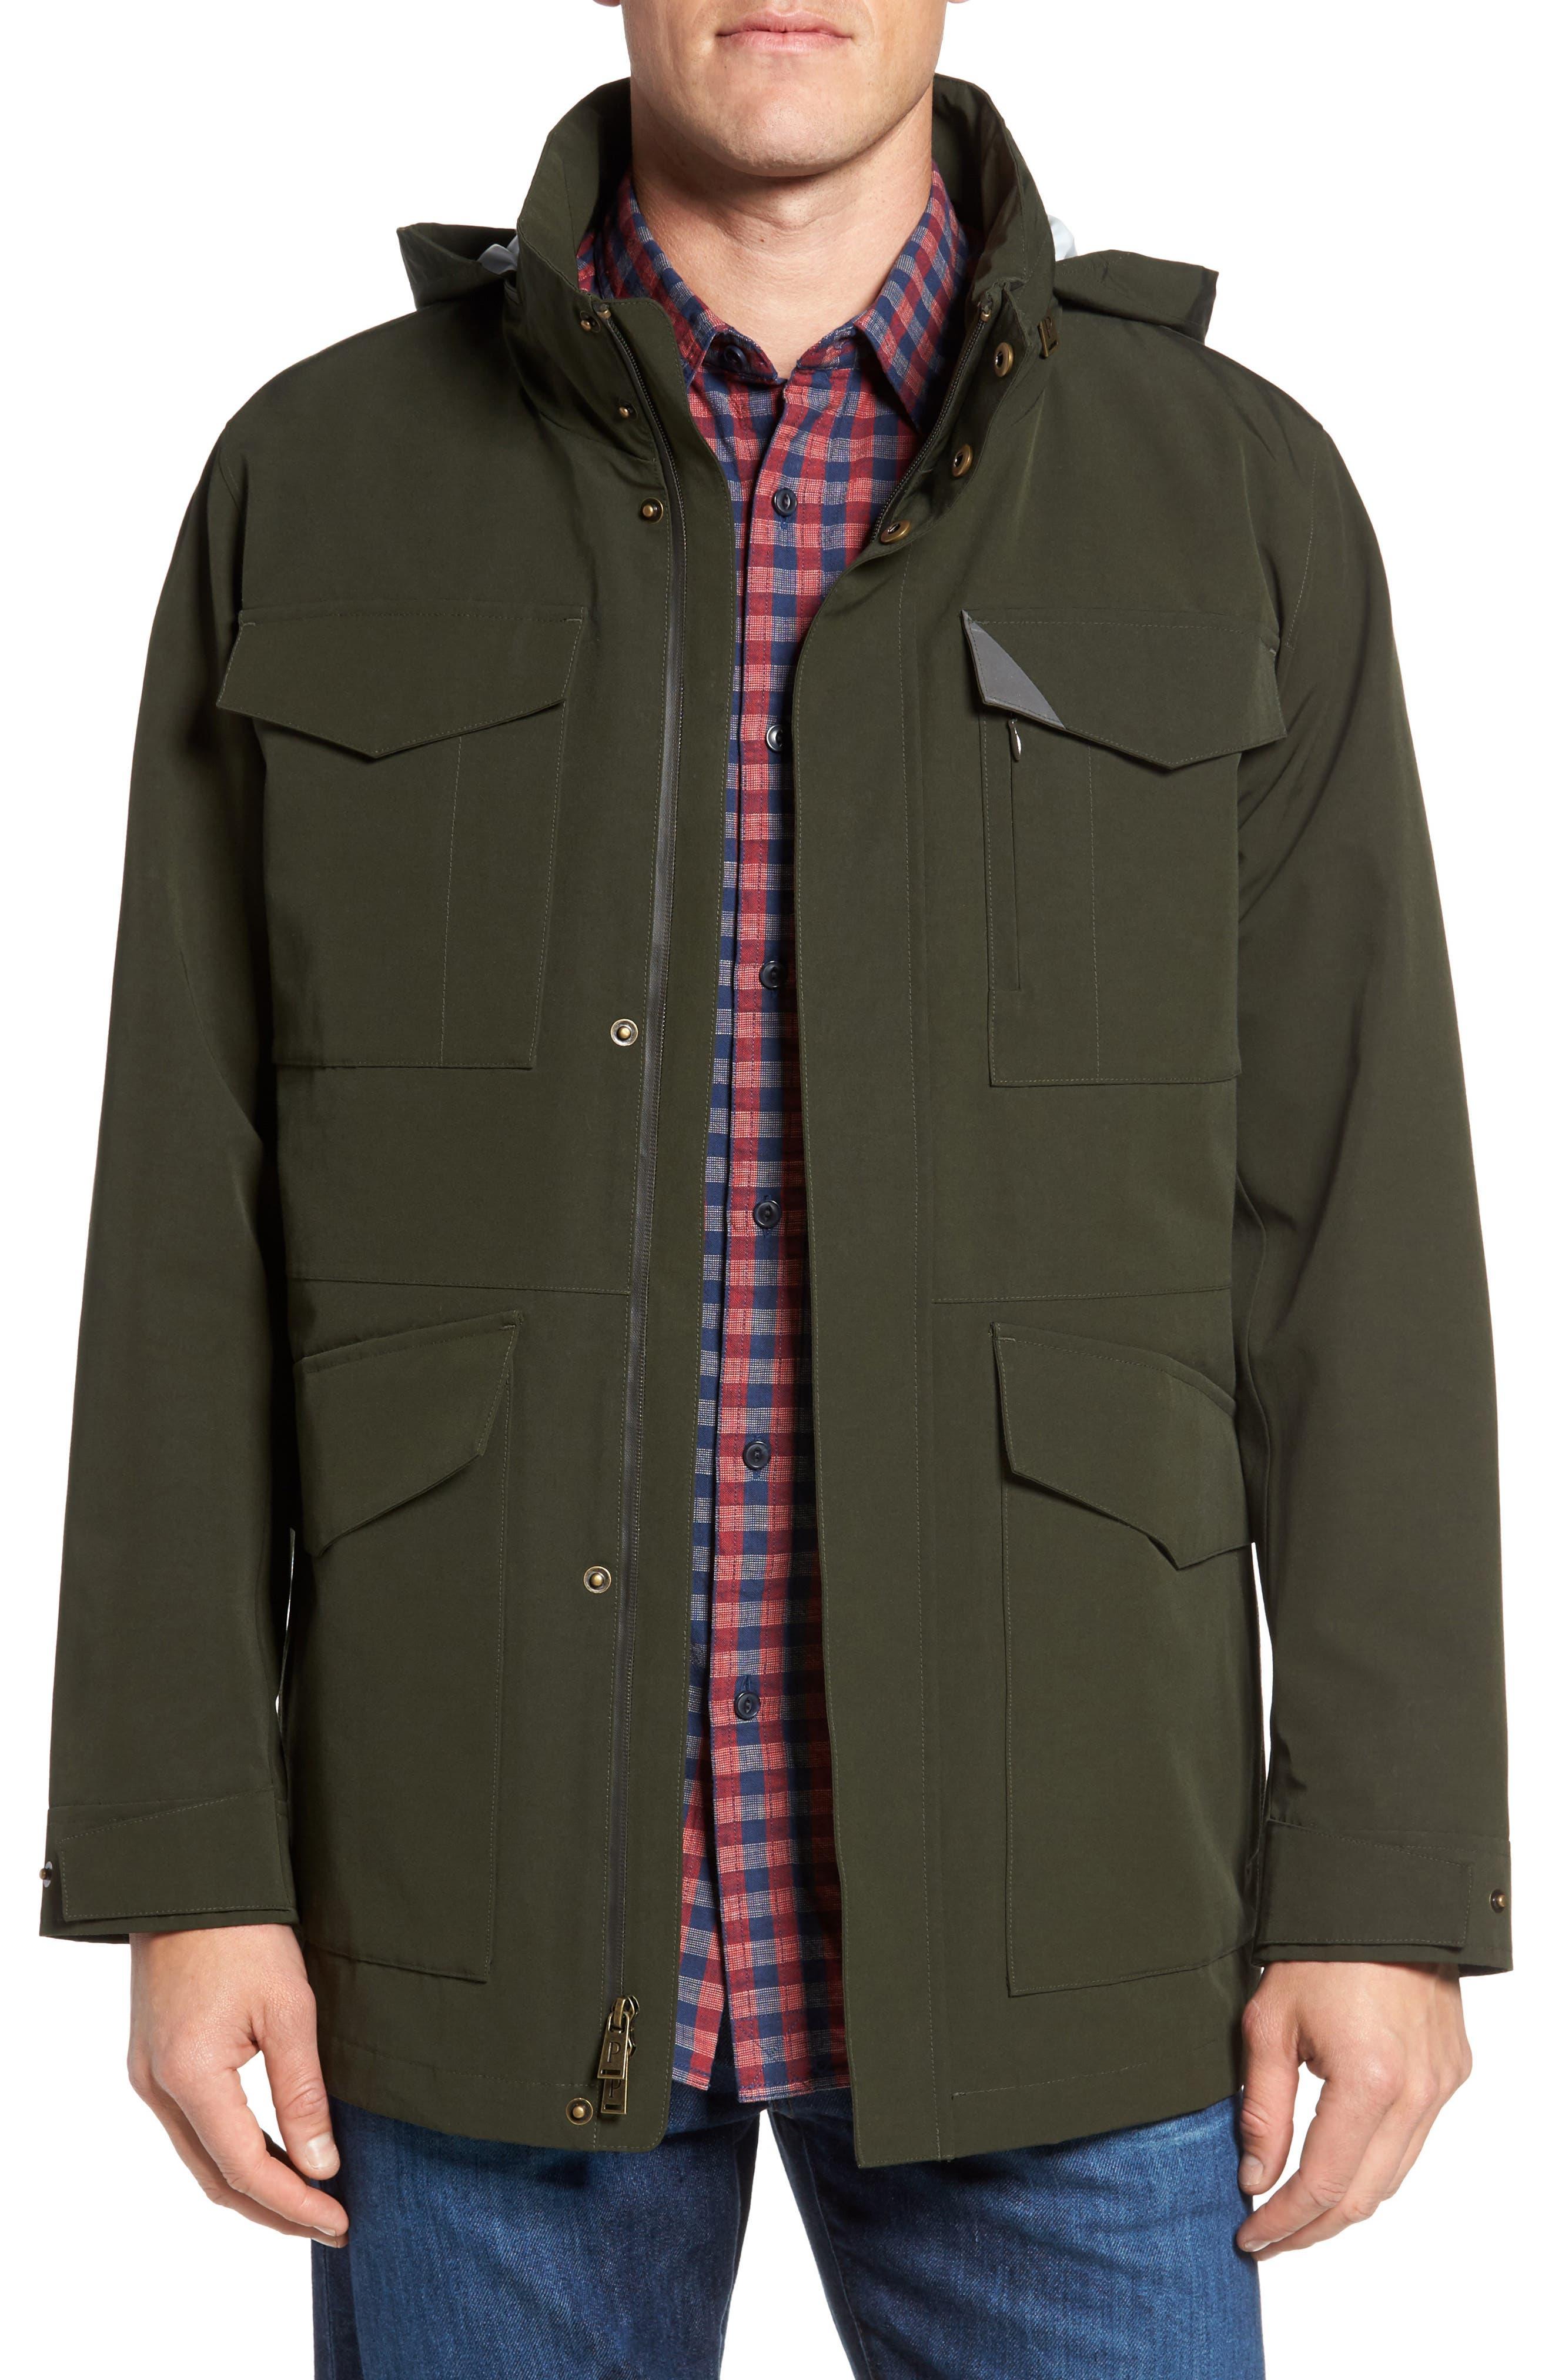 Clyde Hill Waterproof Field Jacket,                         Main,                         color, Rosin